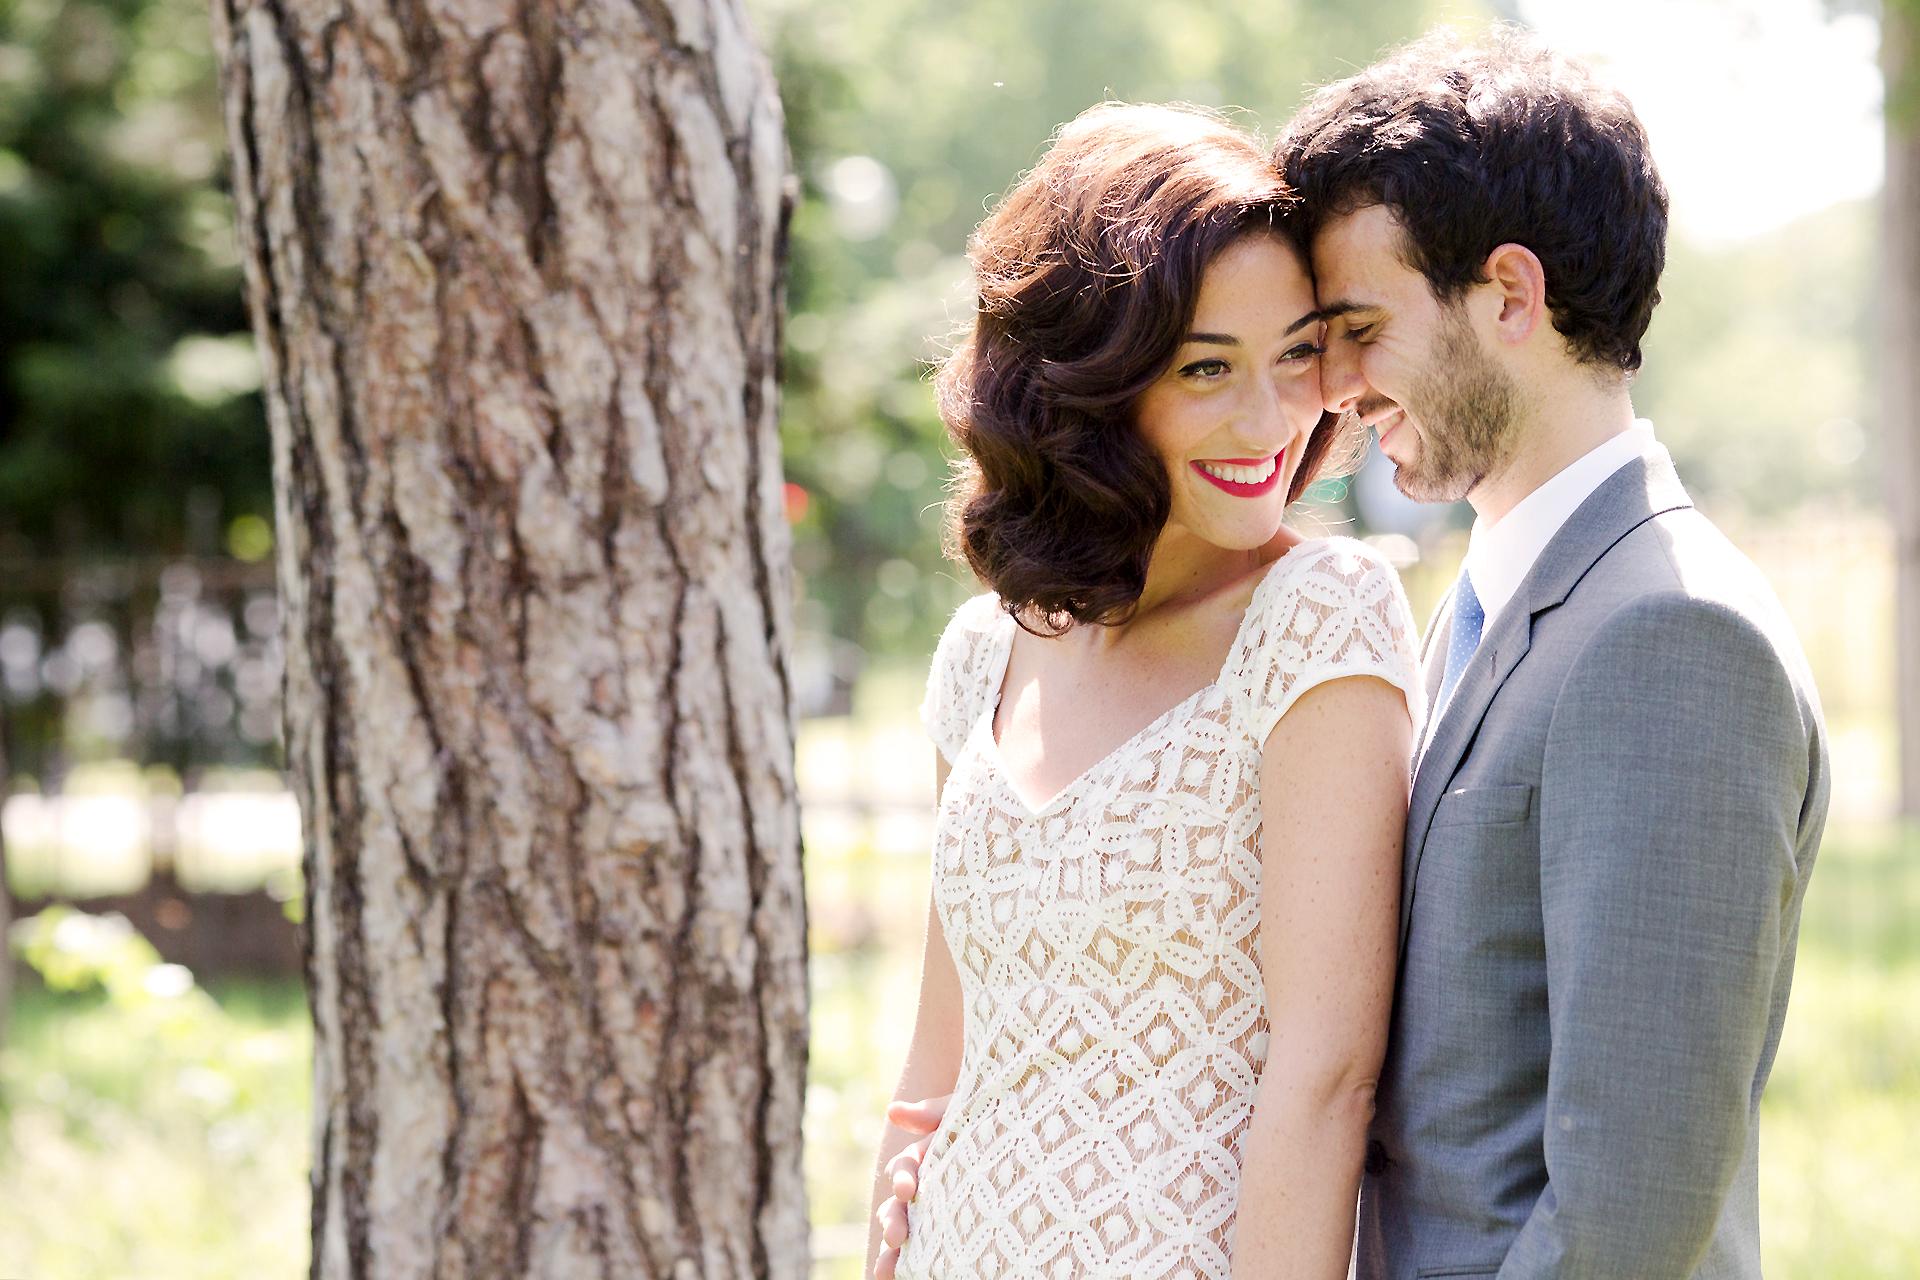 photographe-mariage-oise-paris-chantilly-senlis-keith-flament0012